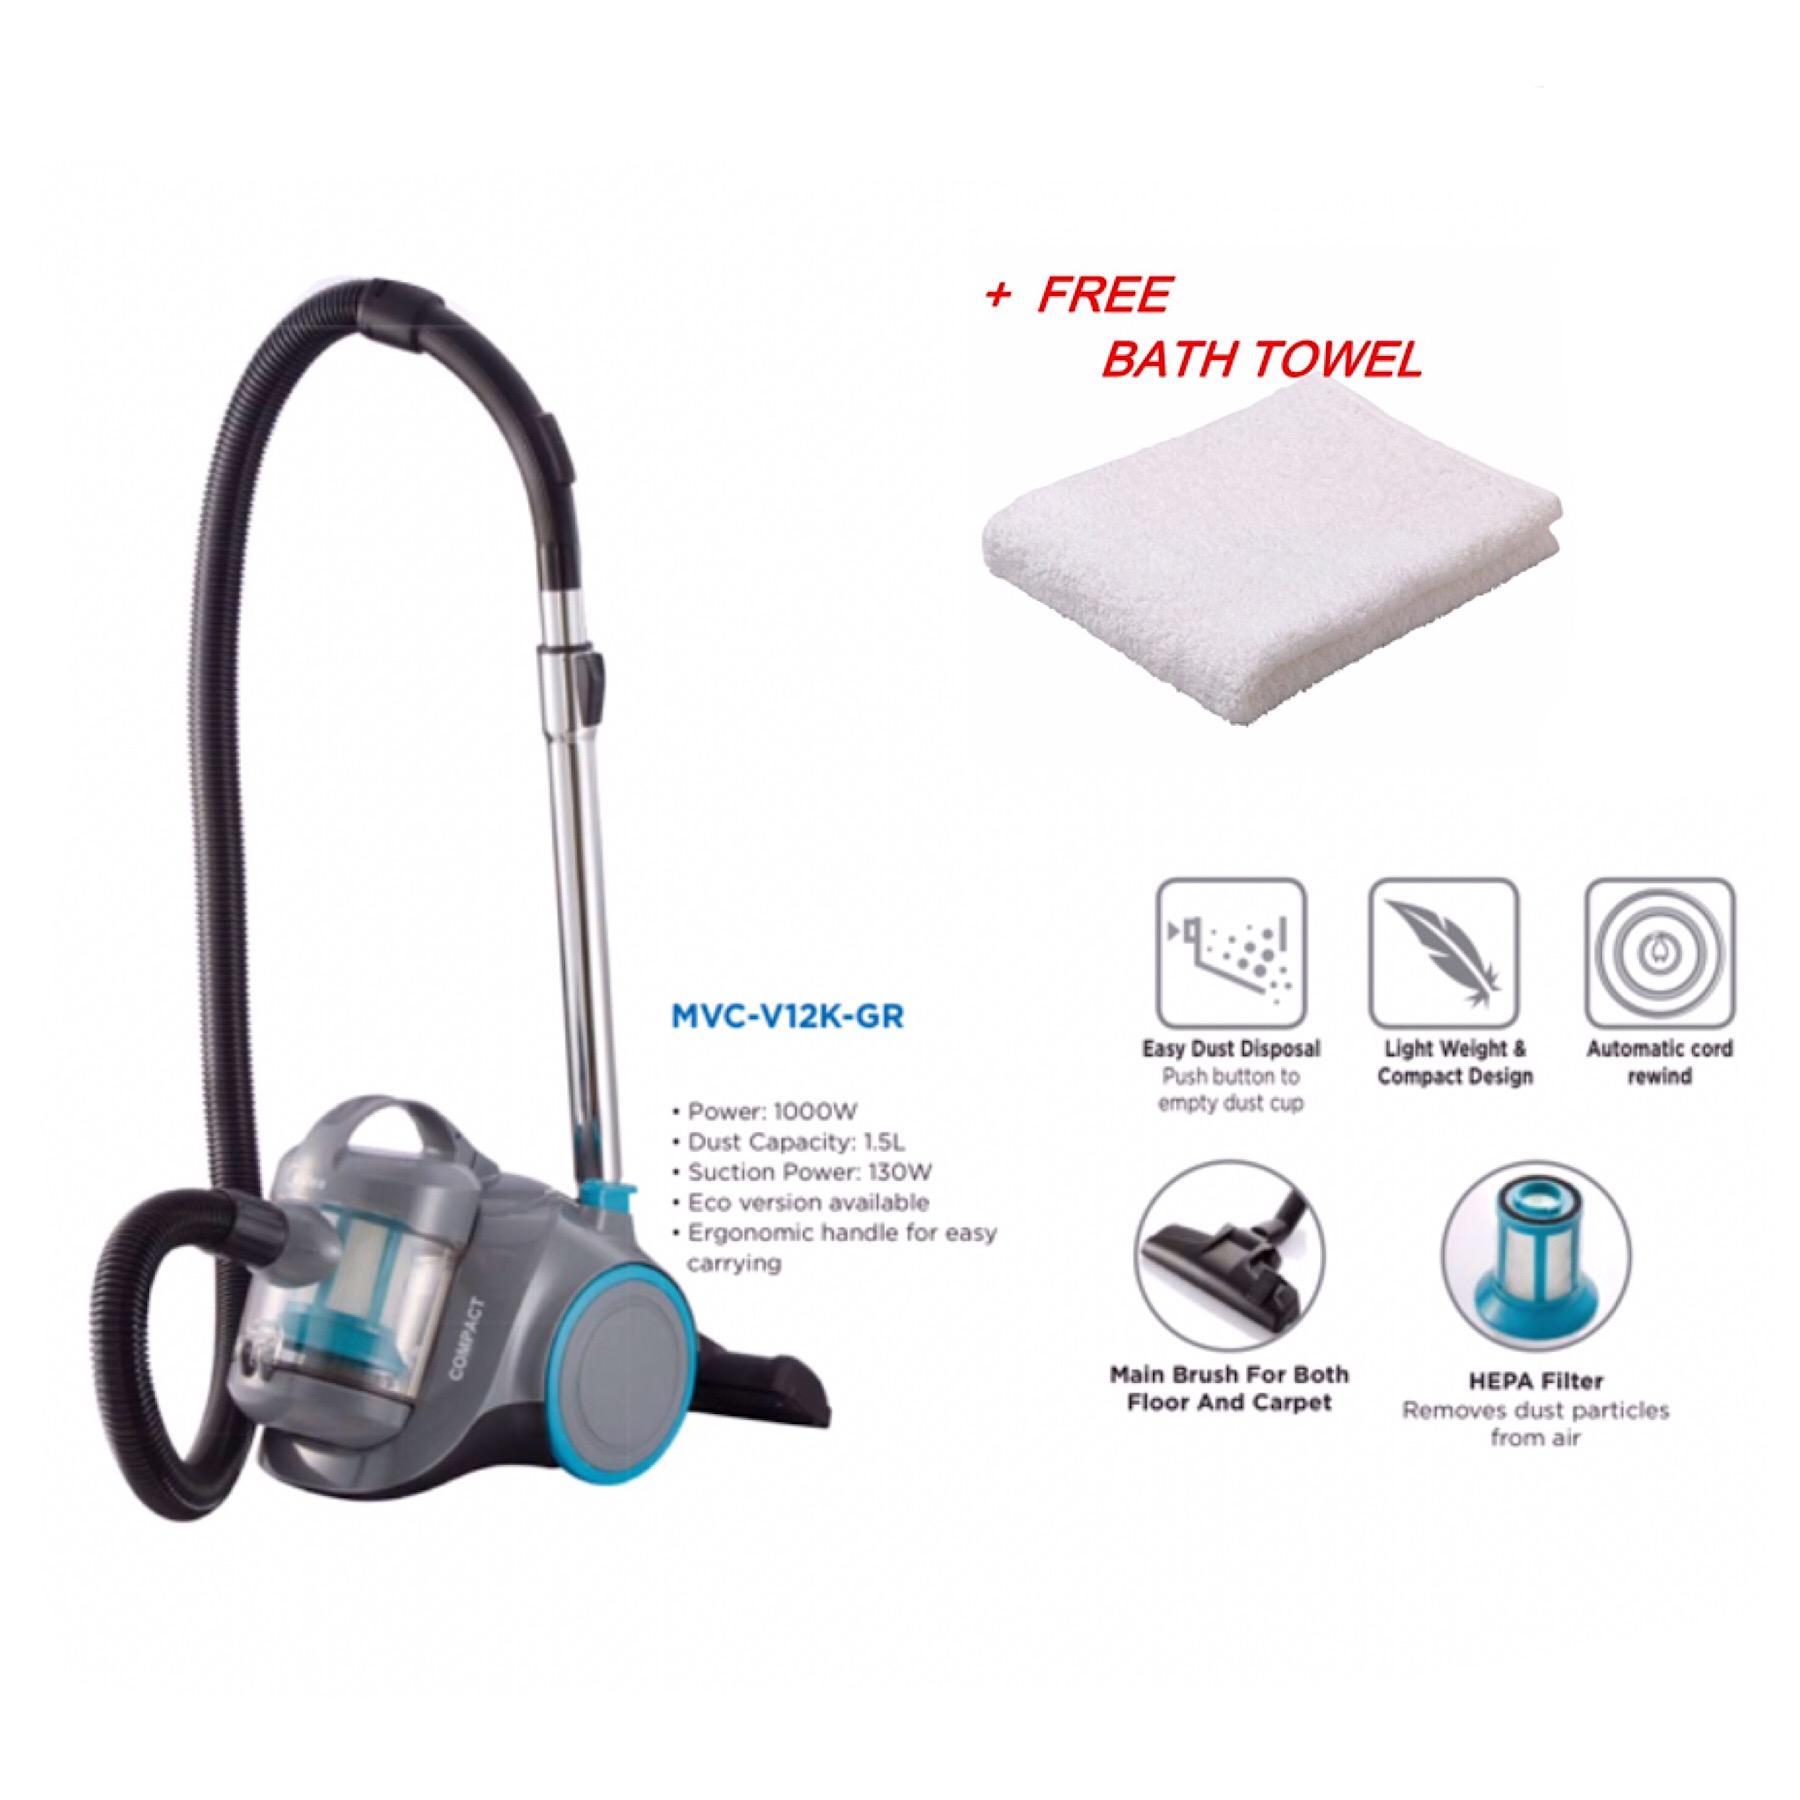 Midea BagLess Hepa Filter 1000W Vacuum Cleaner Grey MVC-V12K-GR